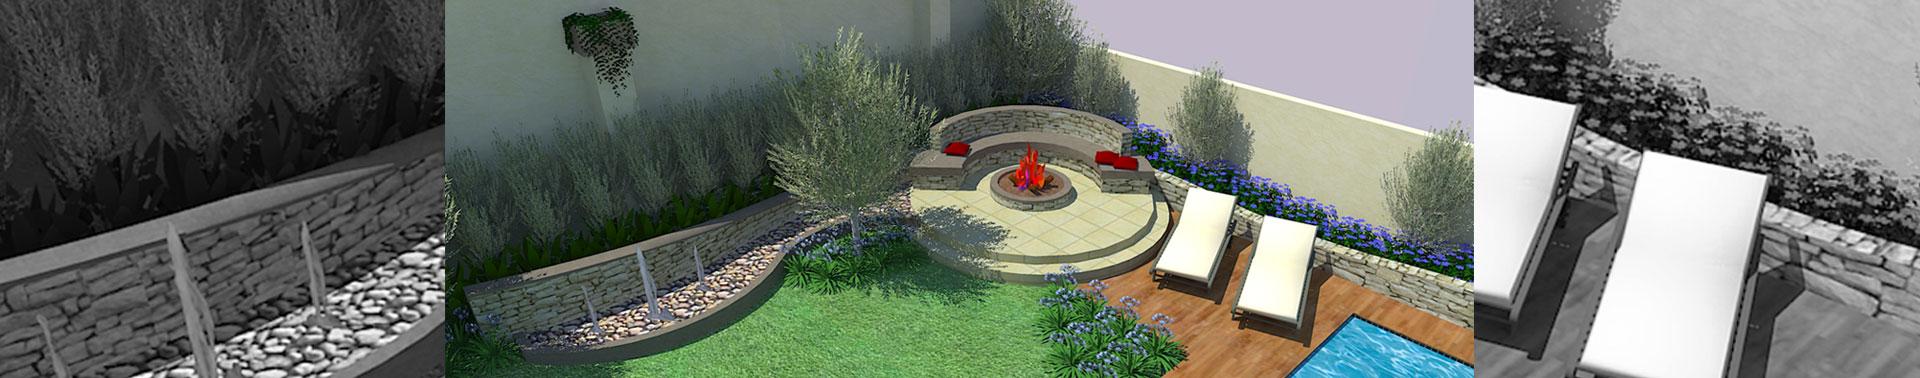 28 brave garden design jobs south africa for Garden designs south africa